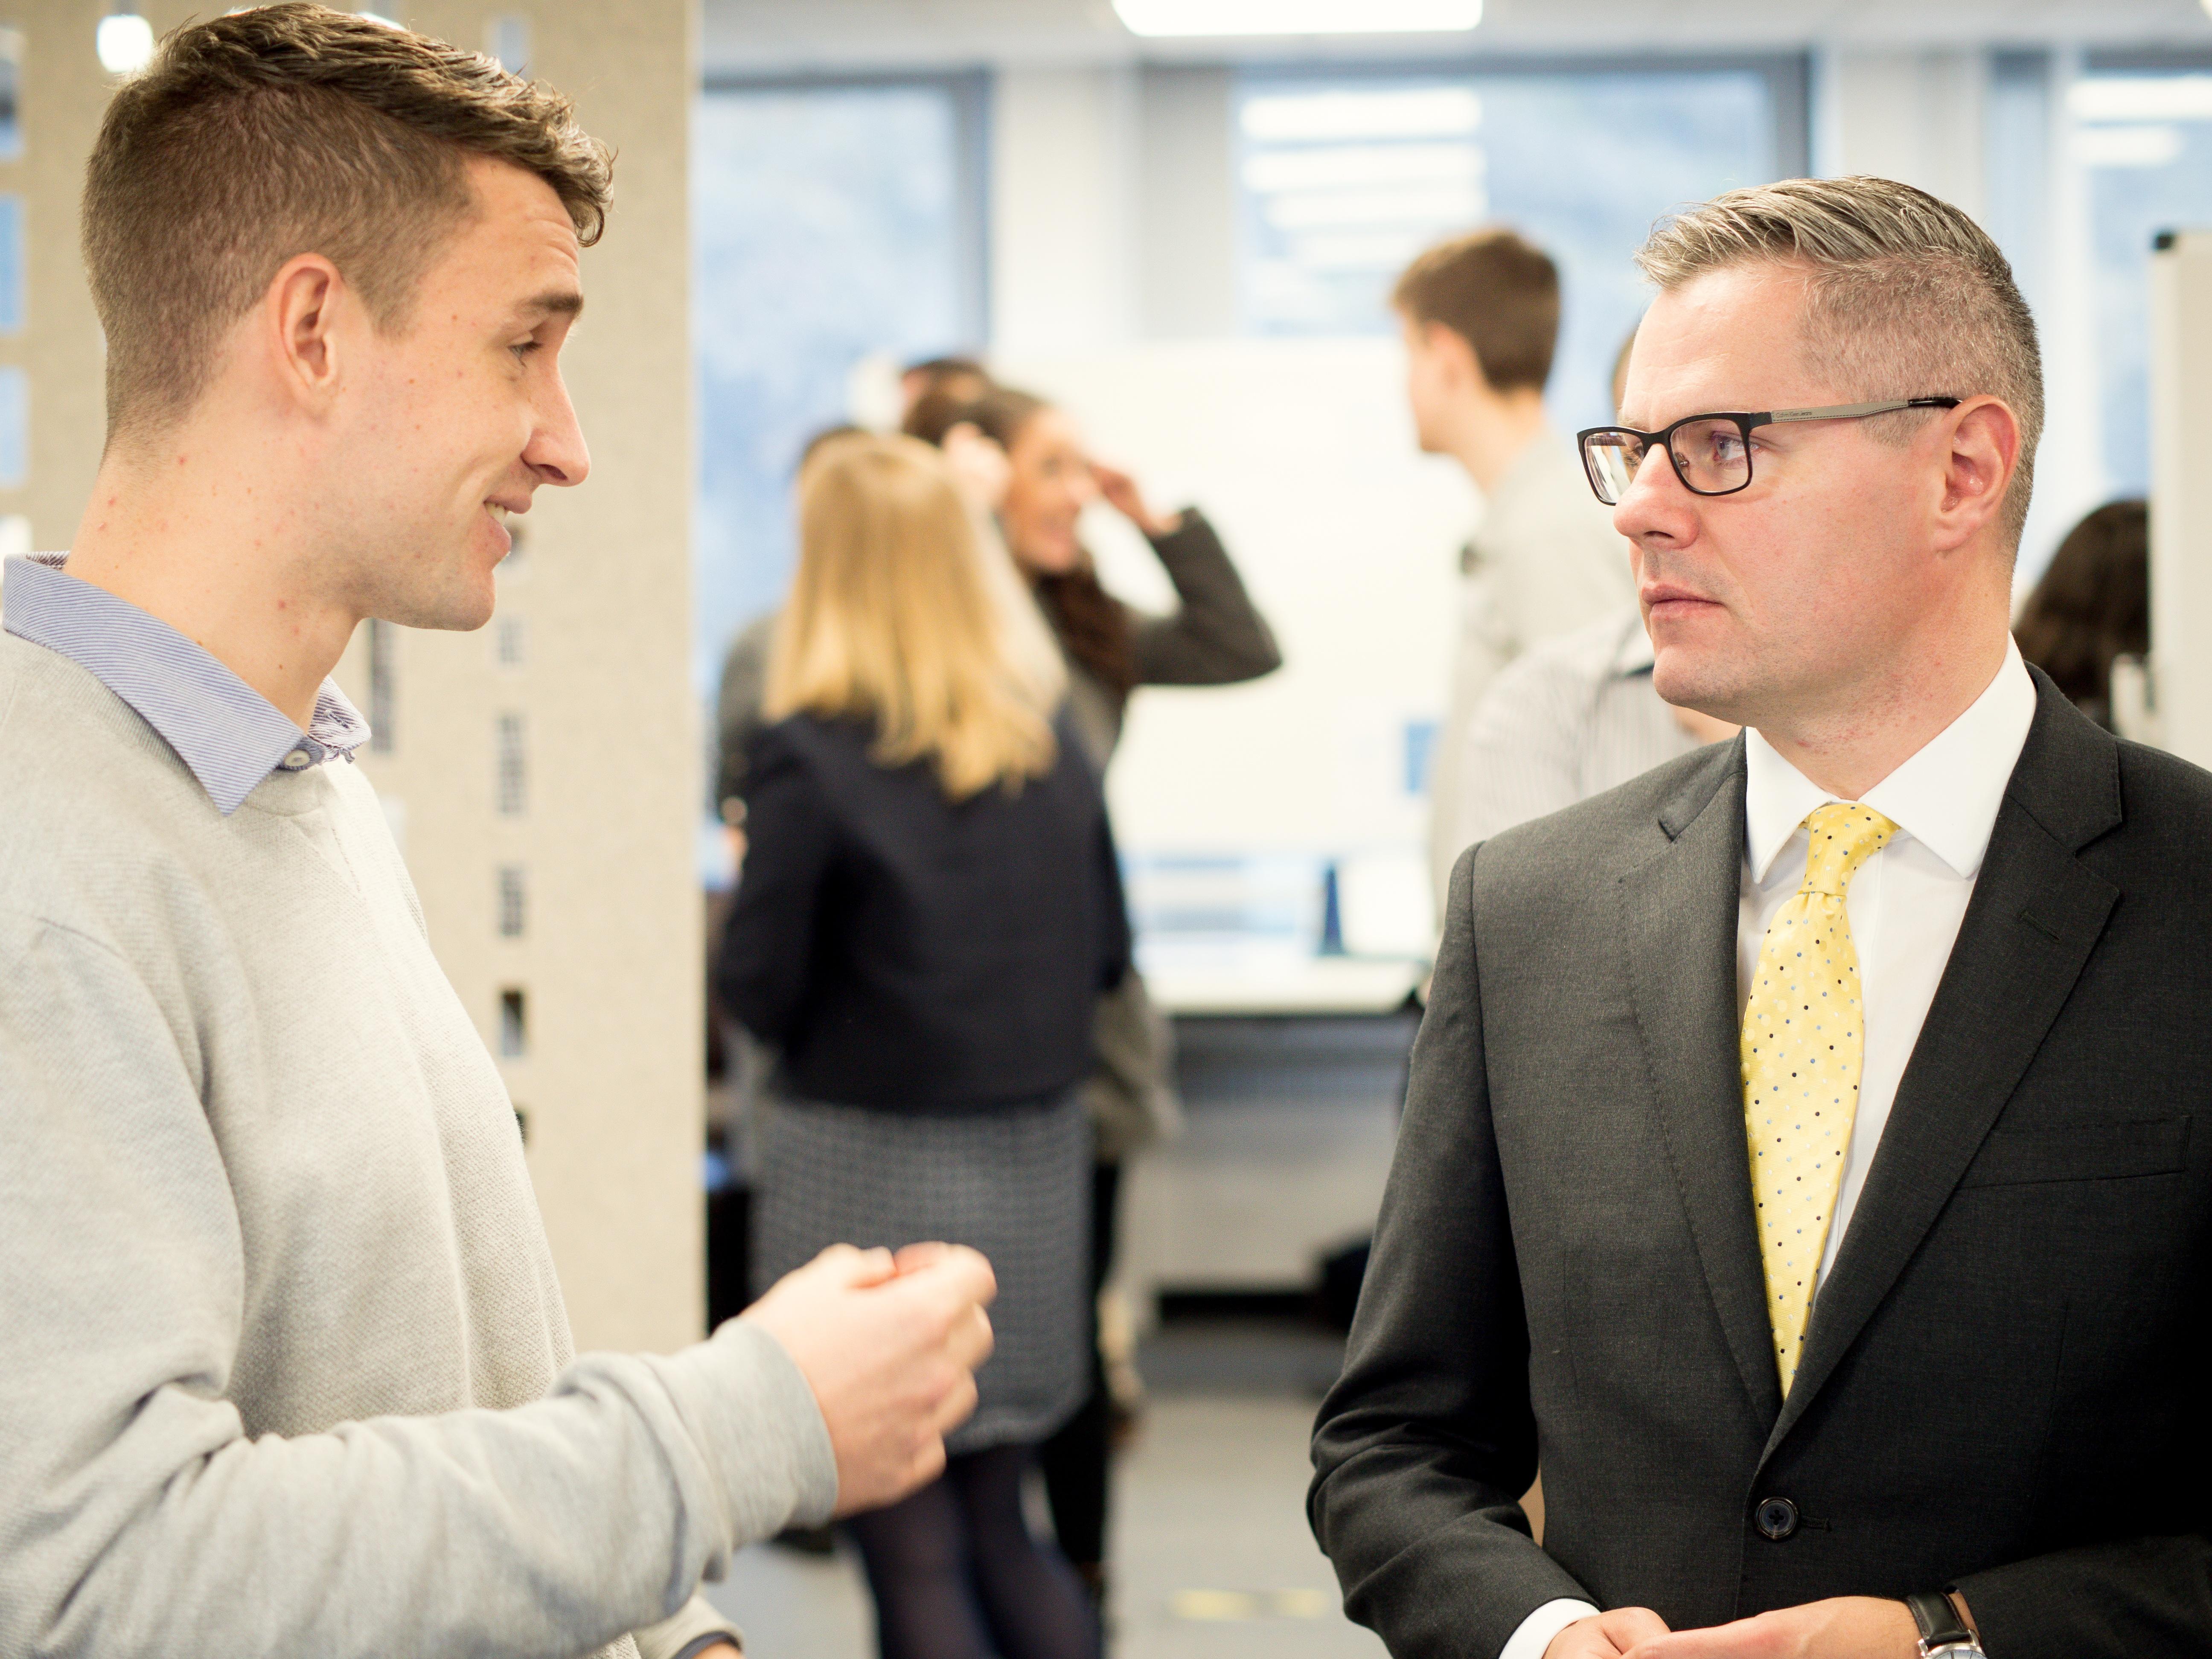 Meeting Derek Mackay MSP, Cabinet Secretary for Finance, Economy & Fair Work.